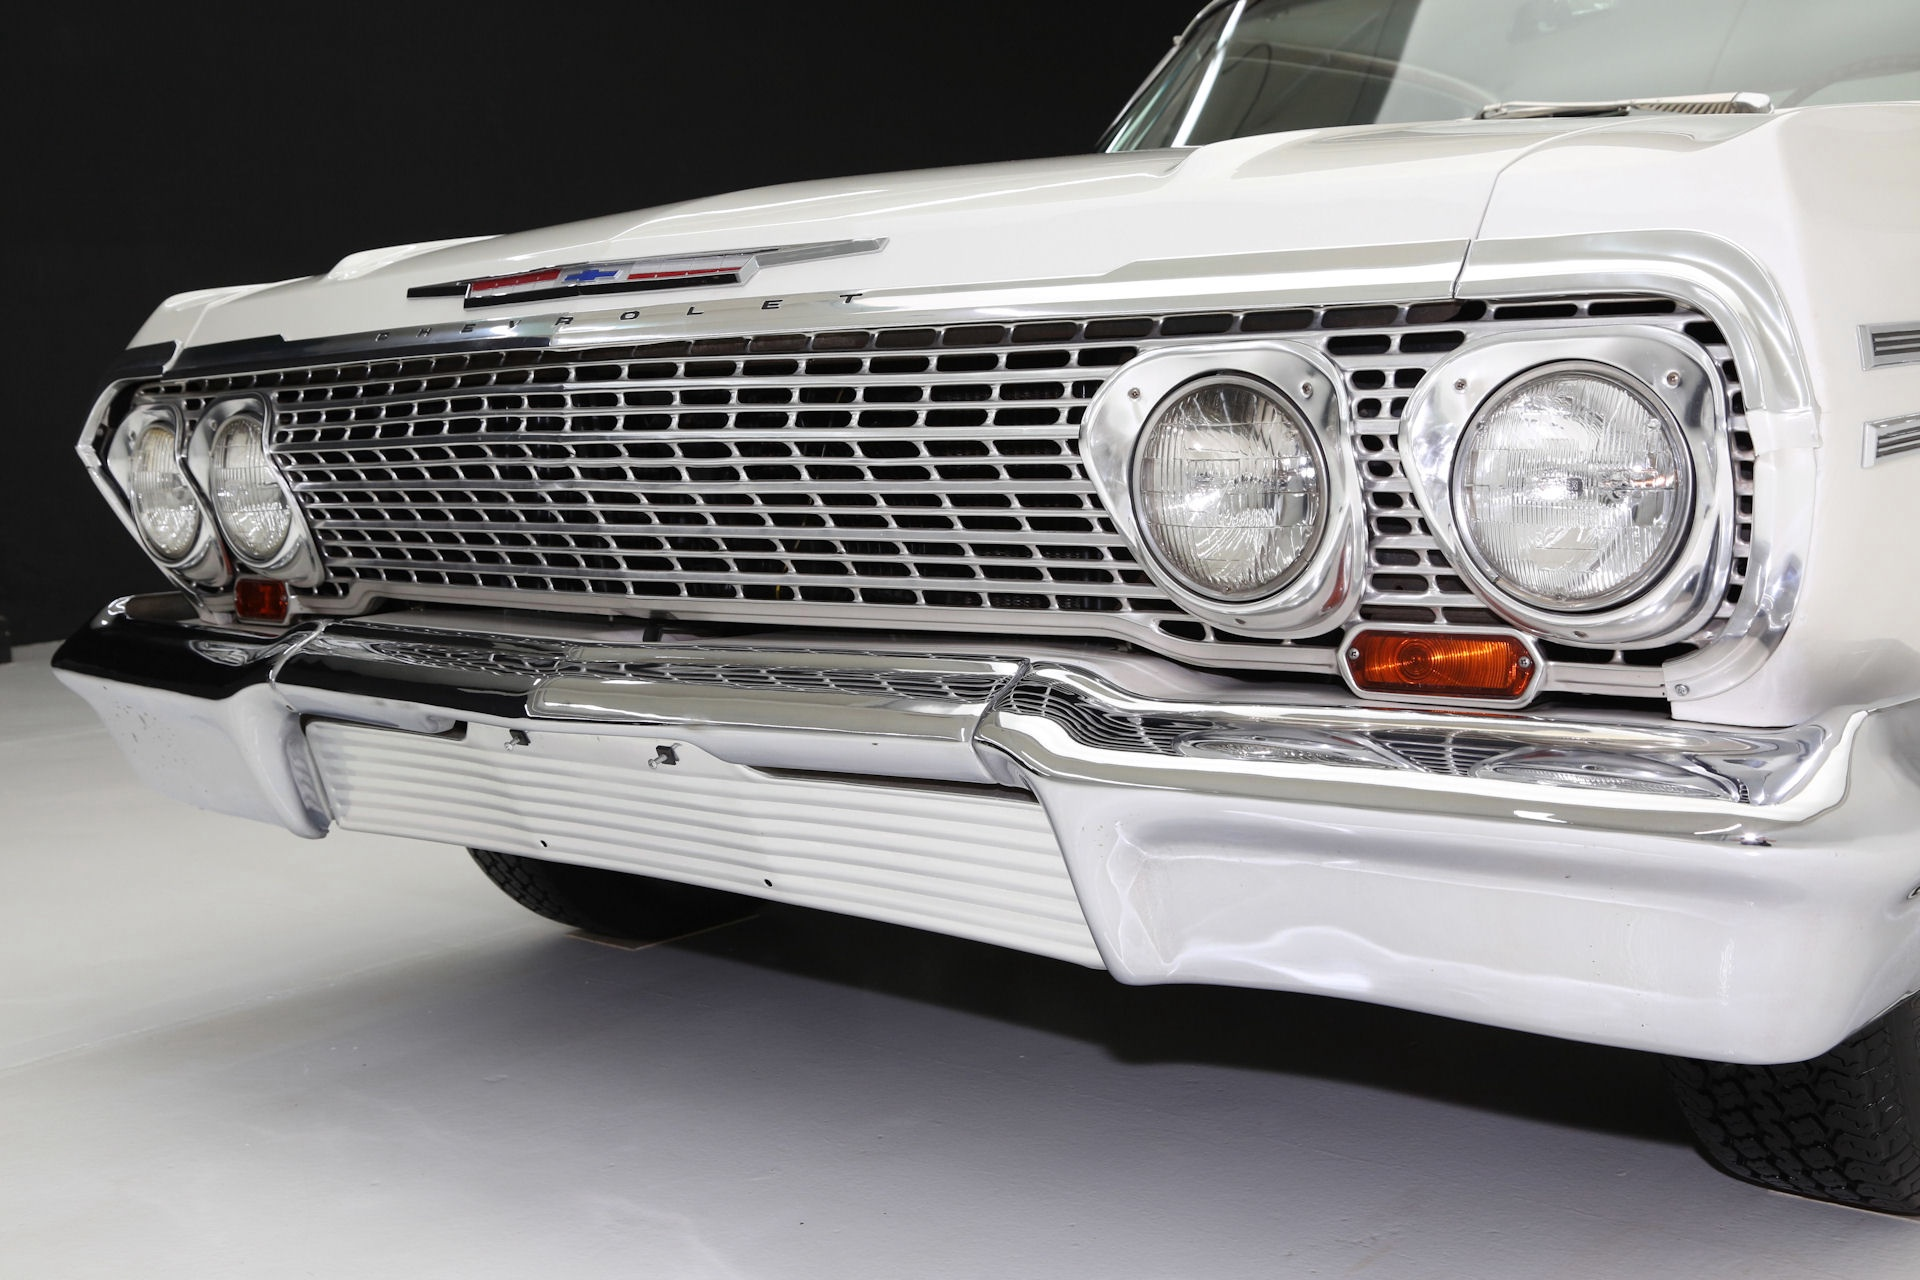 1963 Chevrolet Impala 409 Ss Bucket Seats 4spd